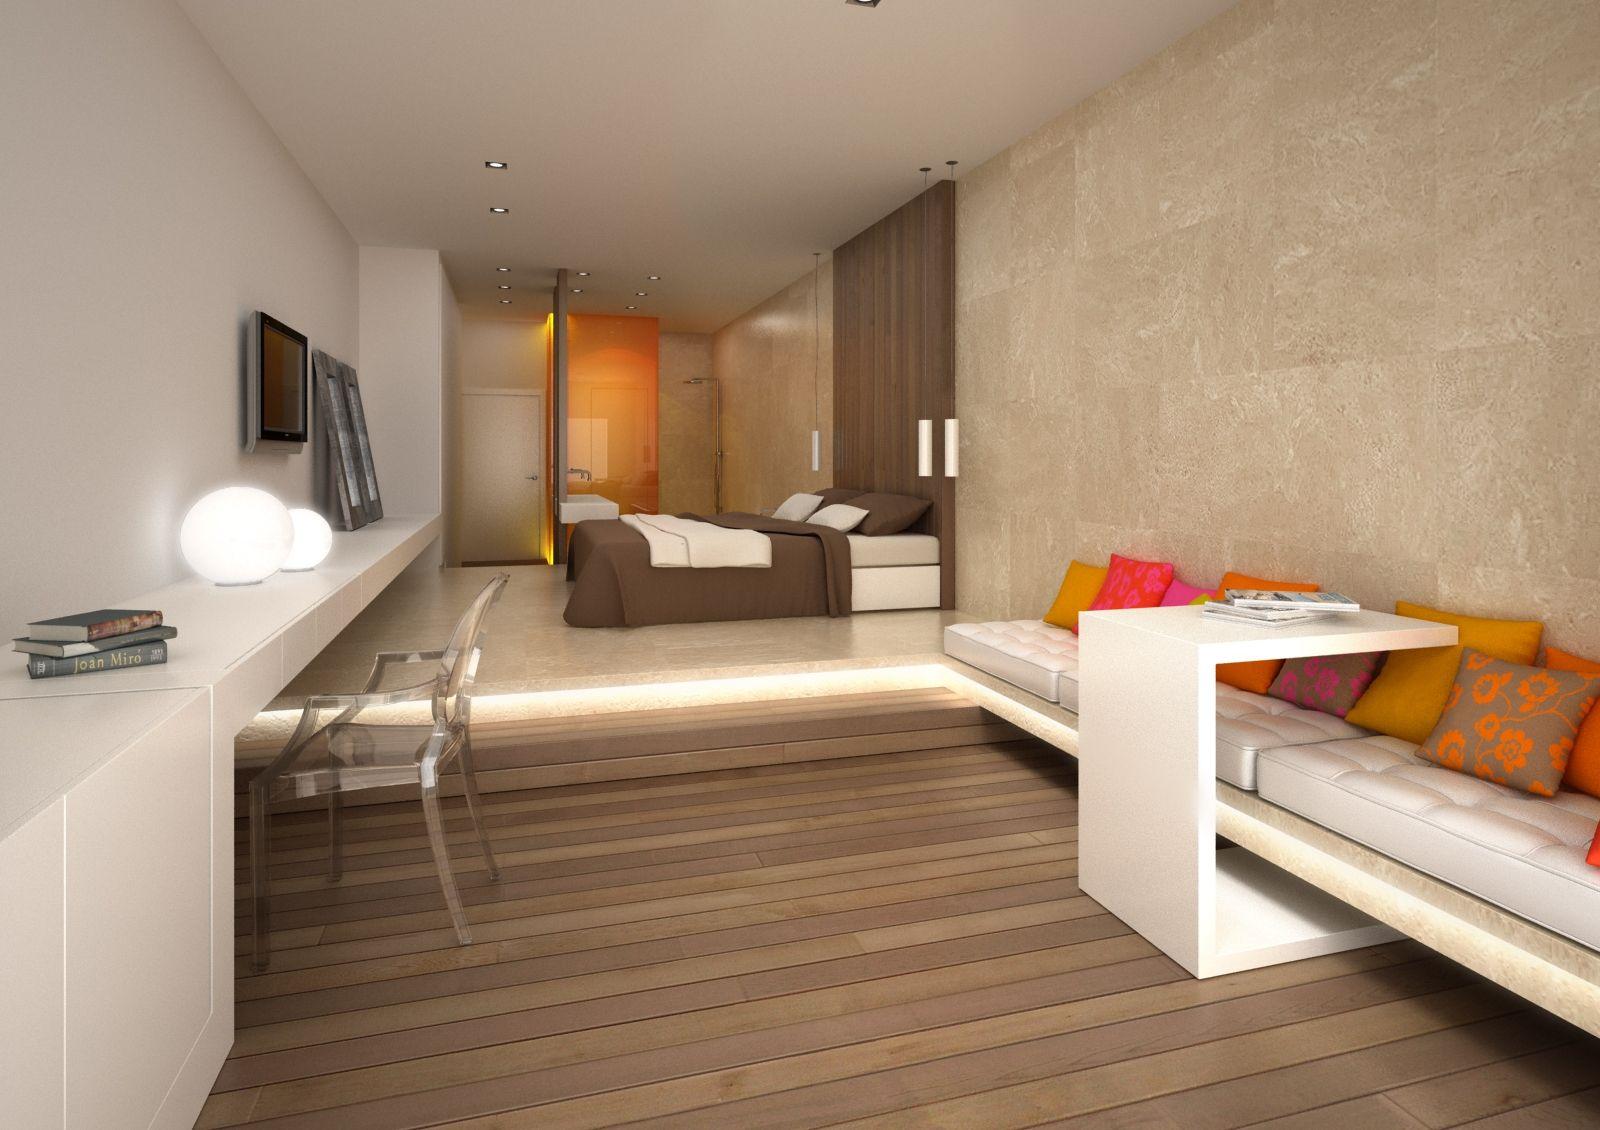 Bestes schlafzimmer schlafzimmer design inspiration  susanna cots  hotel  proposal  hotels bars